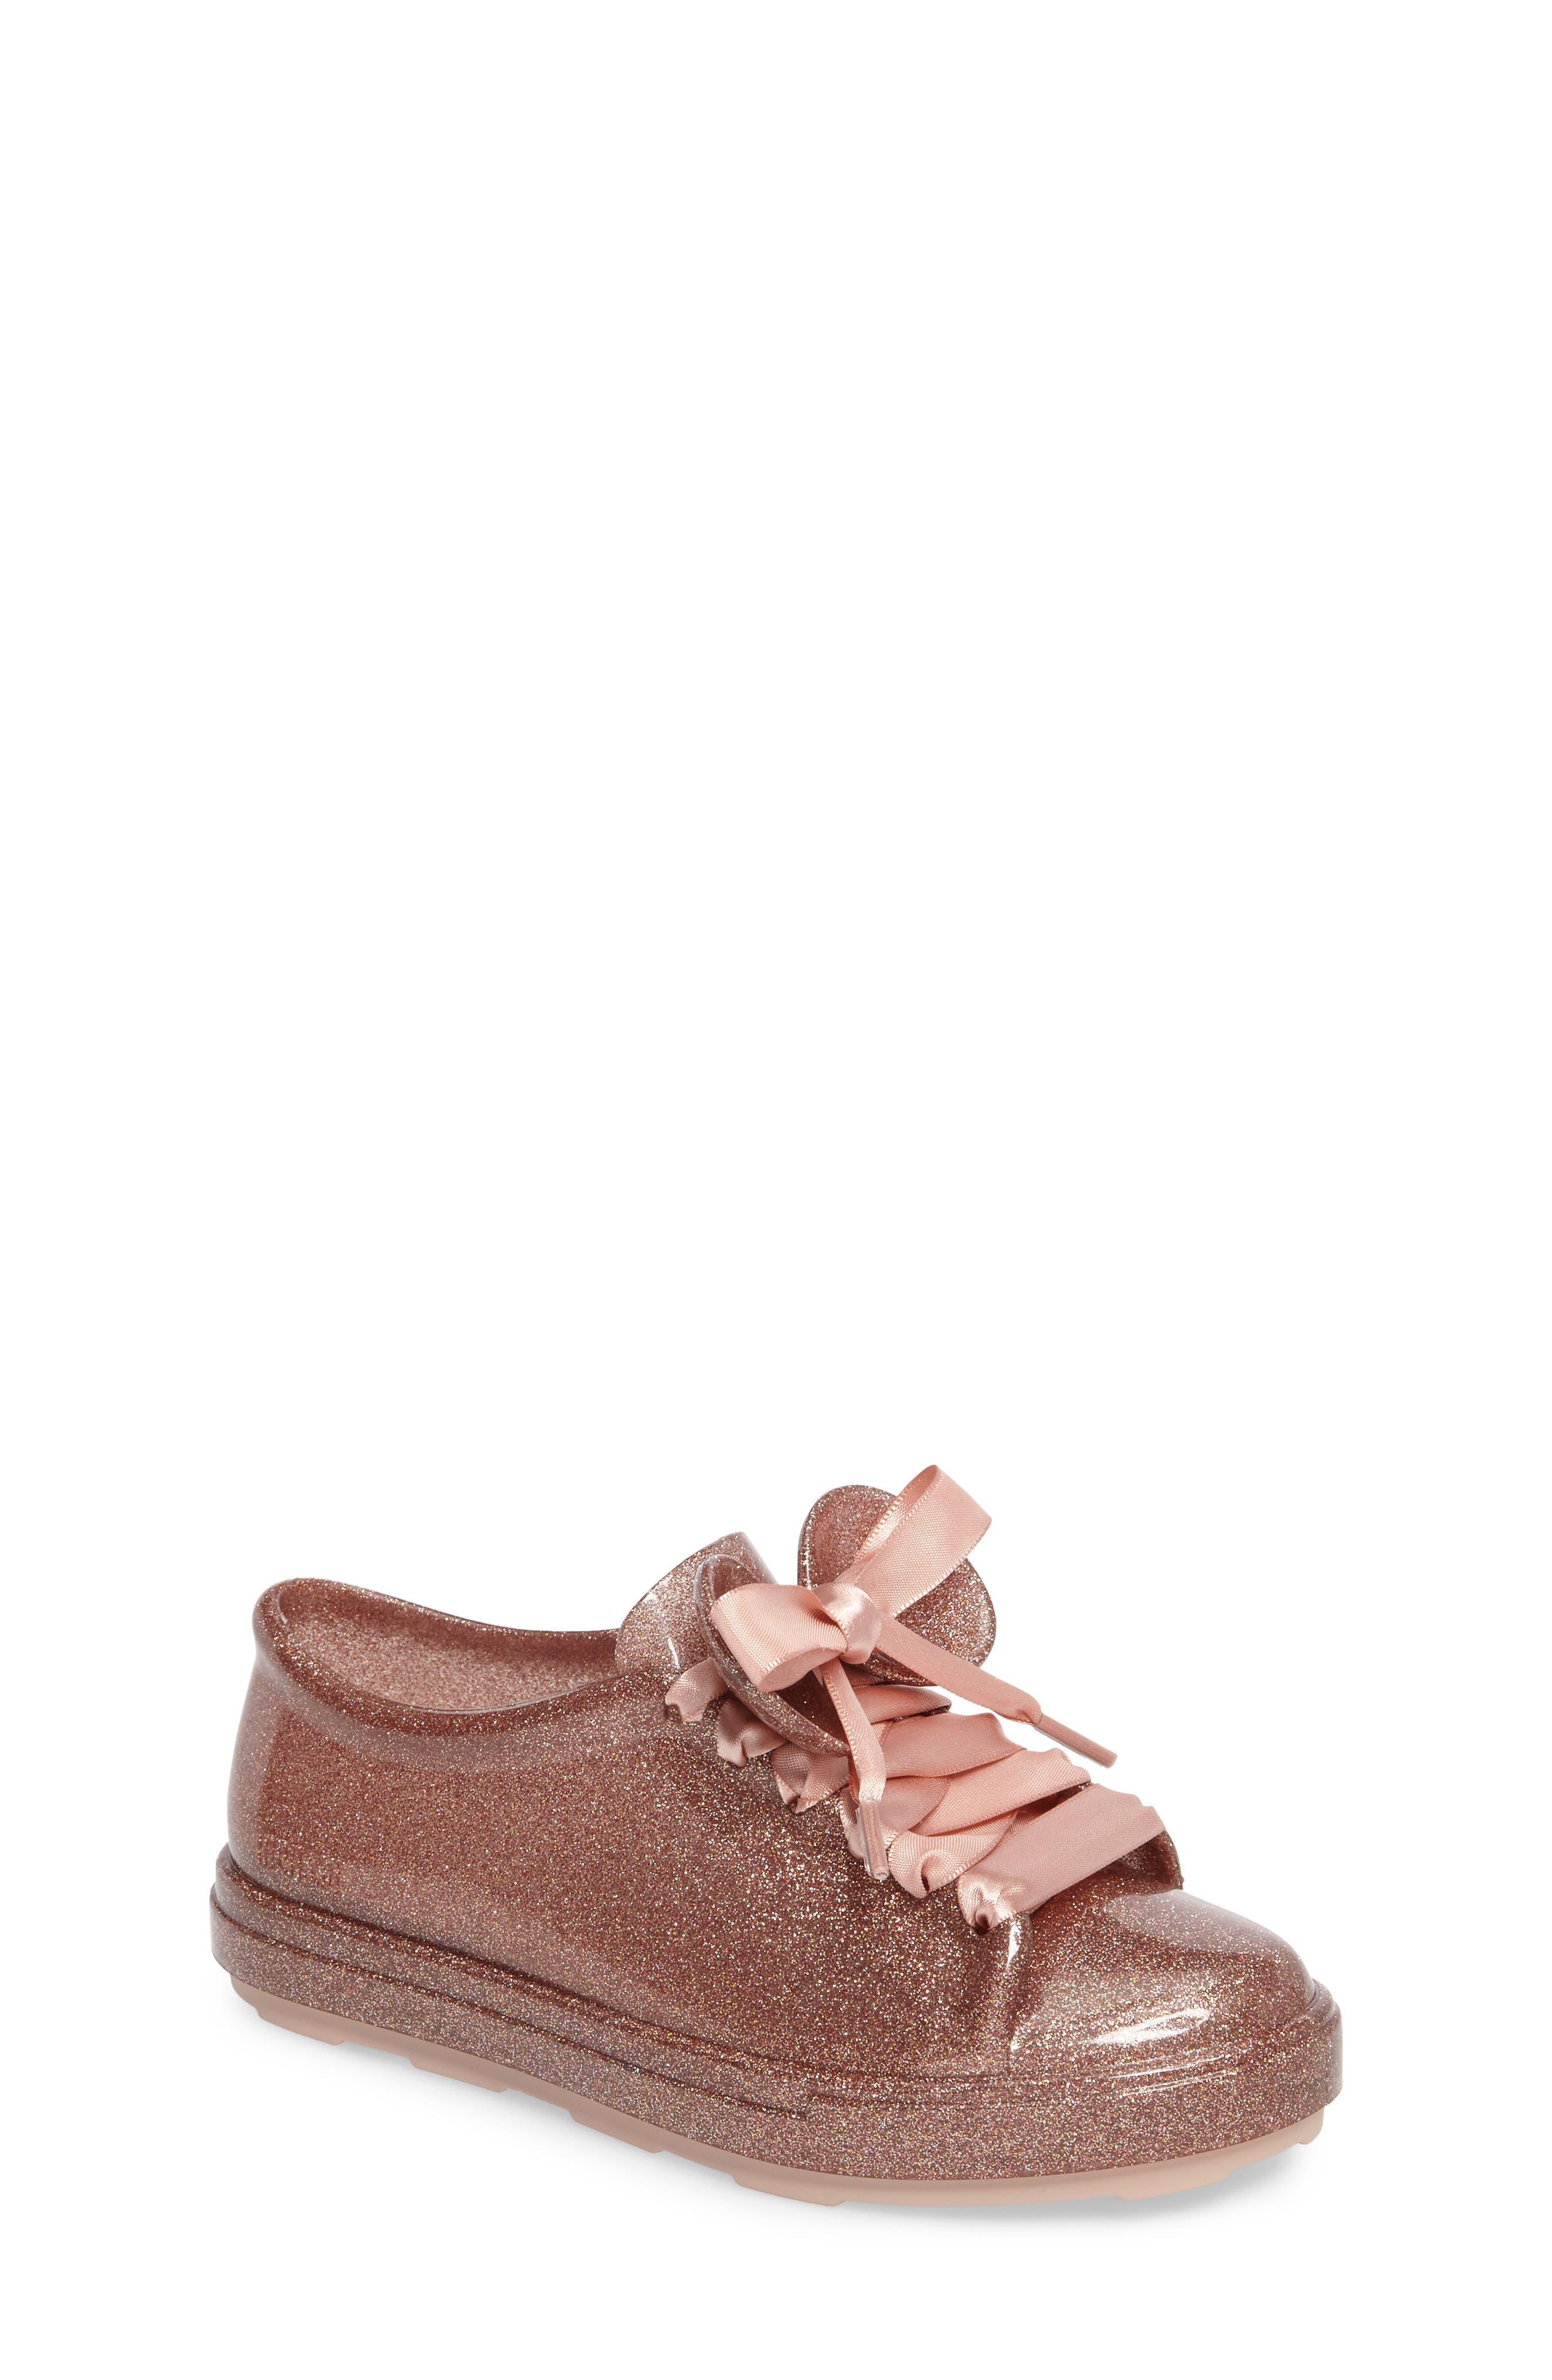 Mel by Melissa Ultragirl + Disney® Sneaker (Toddler, Little Kid & Big Kid)